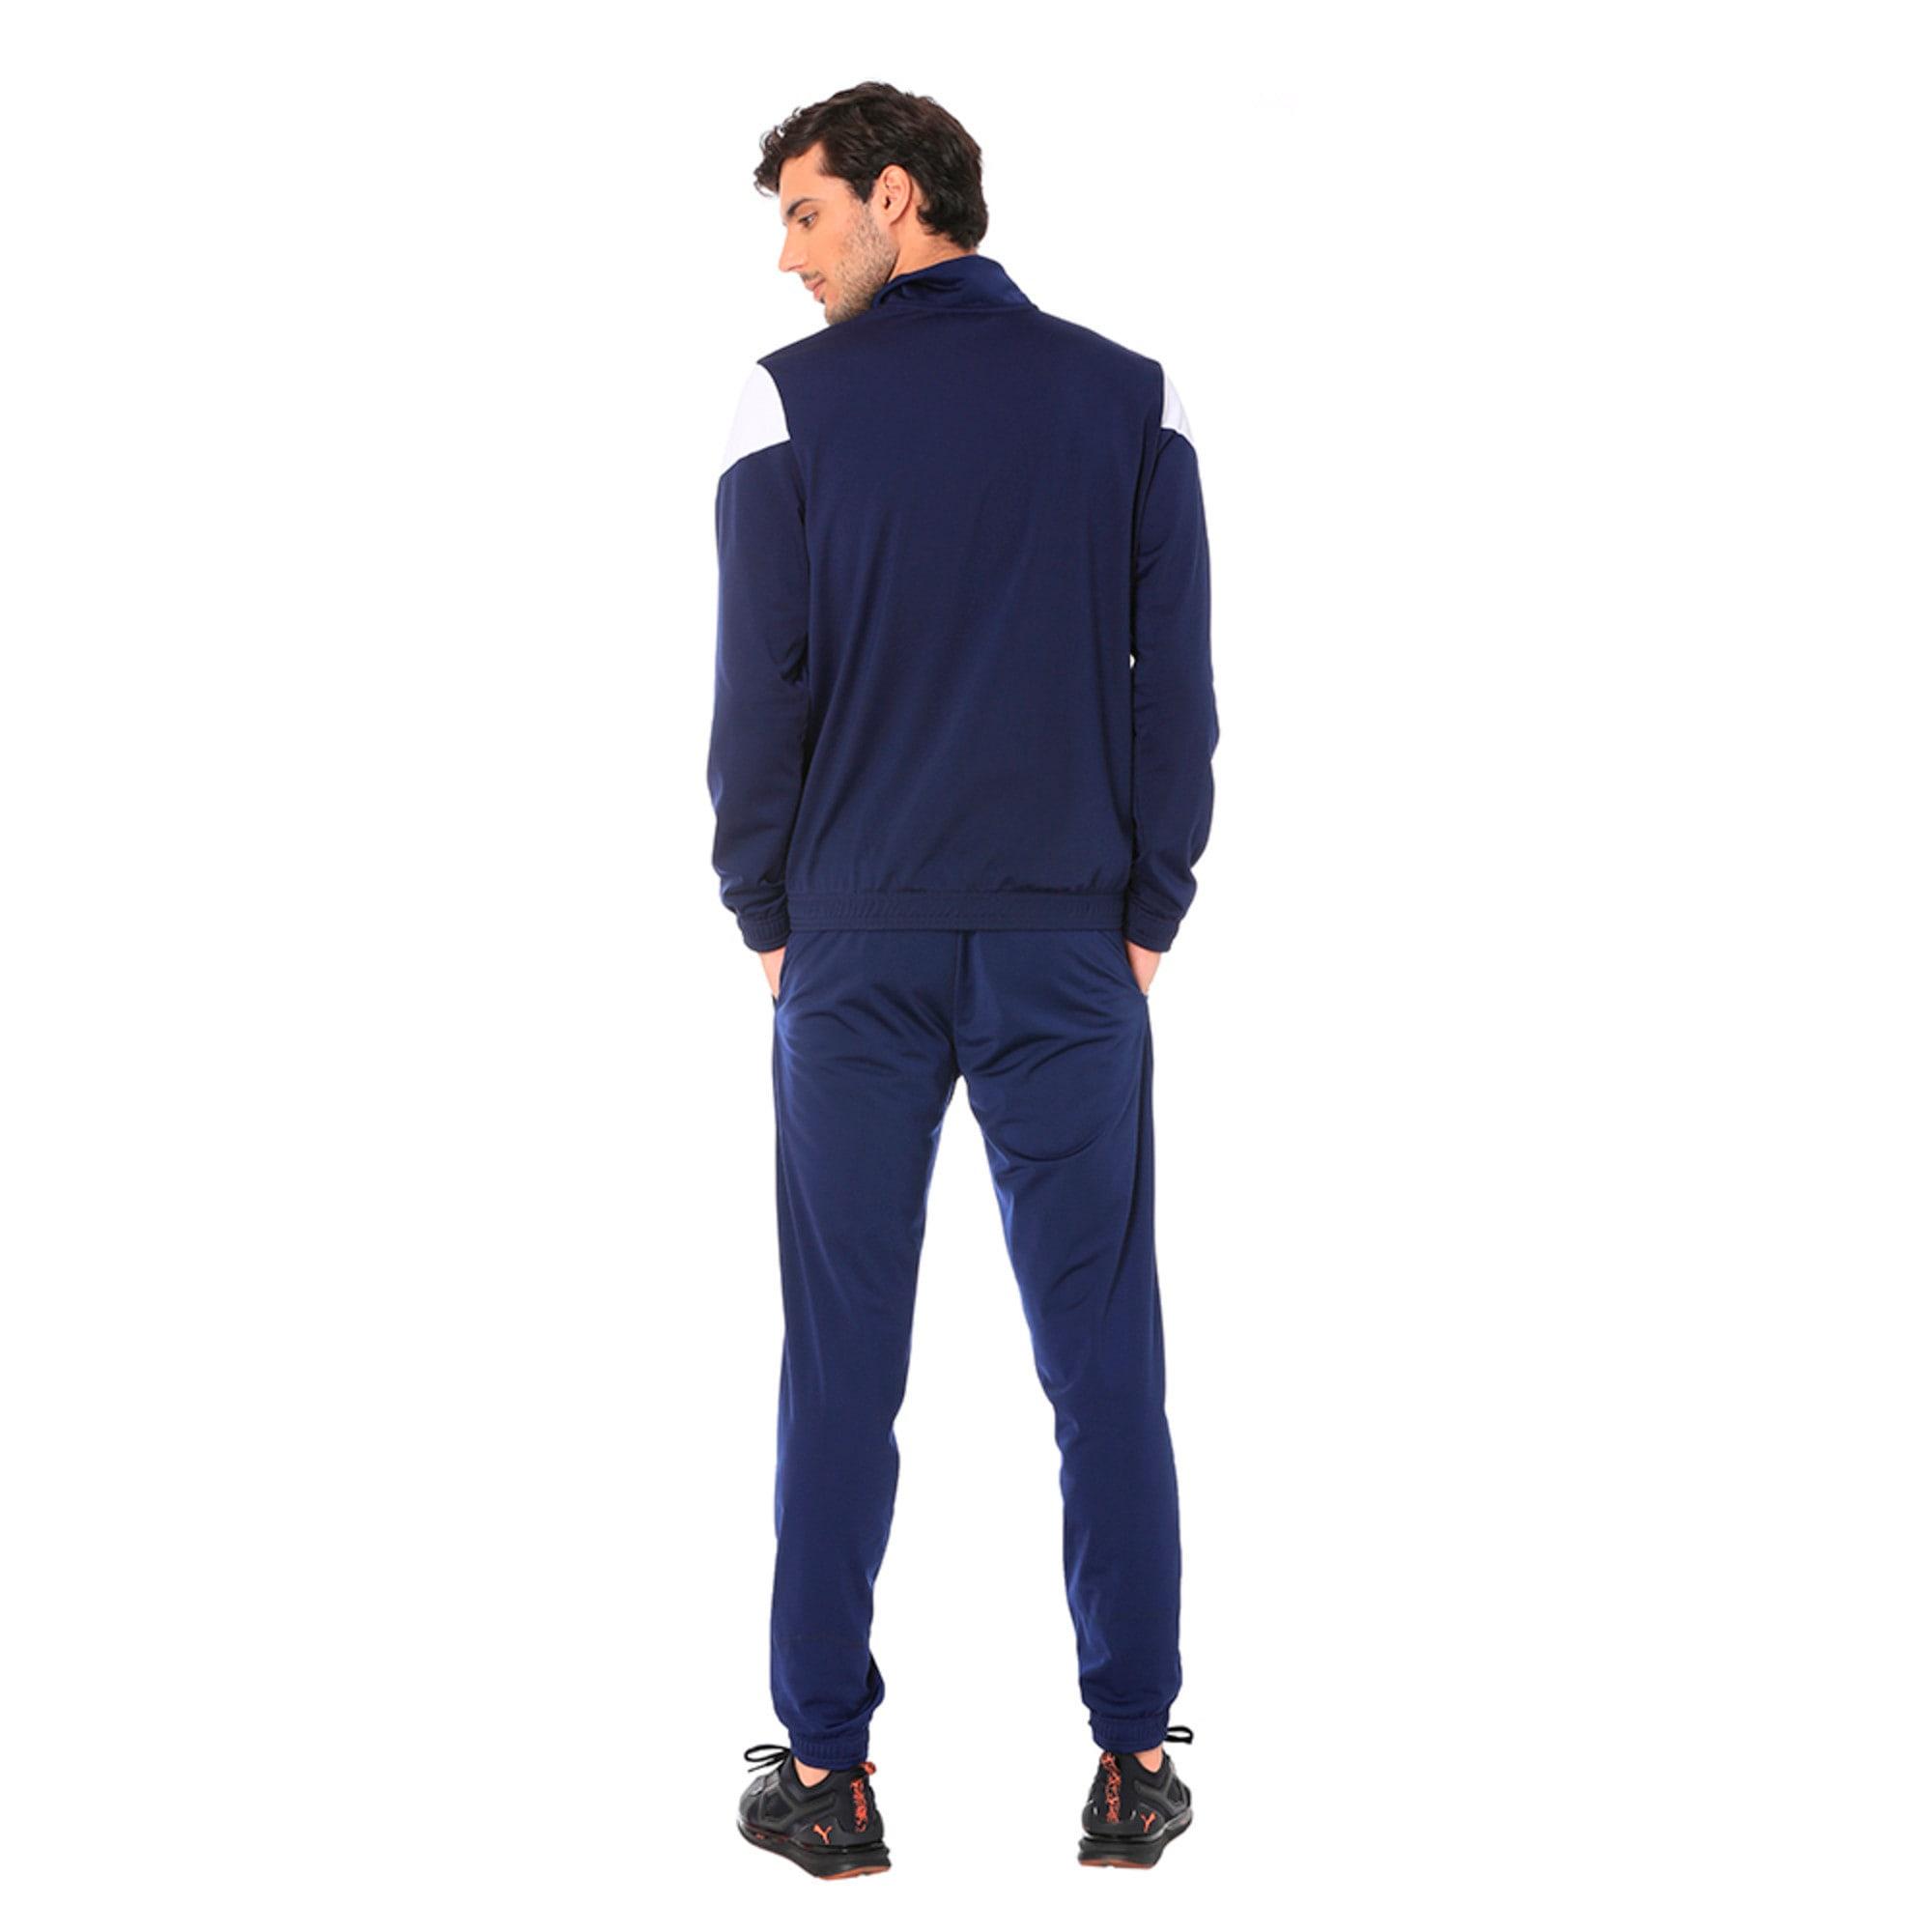 Thumbnail 2 of Clean Tricot Men's Track Suit, Peacoat, medium-IND